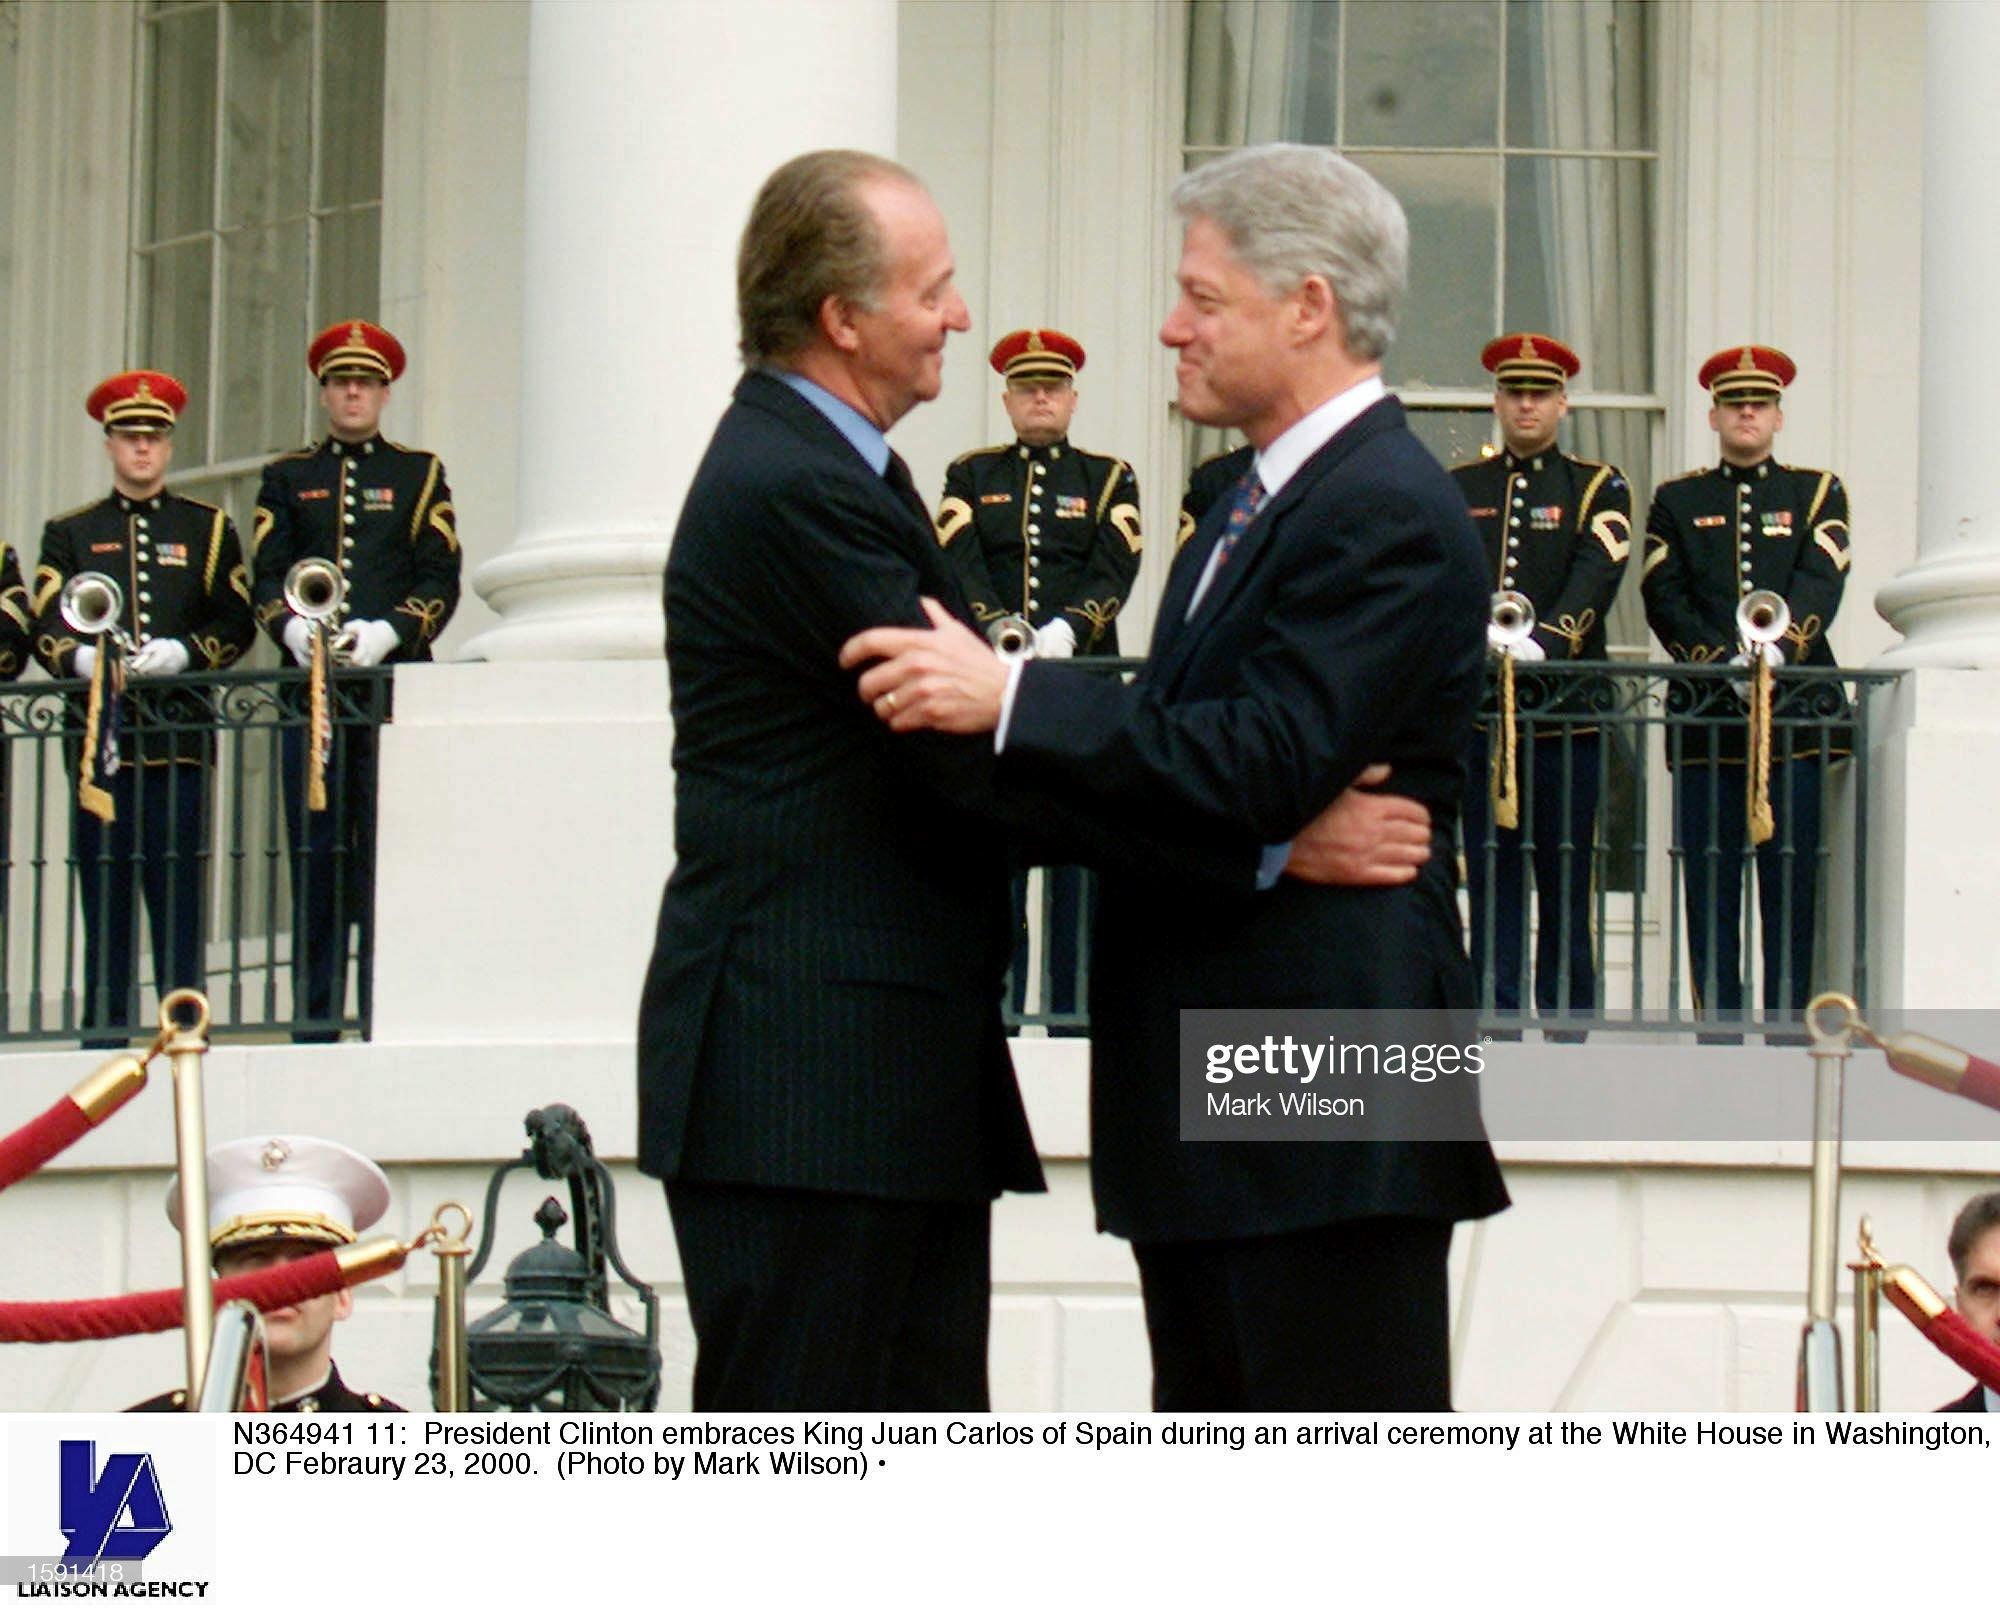 ¿Cuánto mide el Rey Juan Carlos I? - Altura - Real height - Página 2 President-clinton-embraces-king-juan-carlos-of-spain-during-an-at-picture-id1591418?s=2048x2048